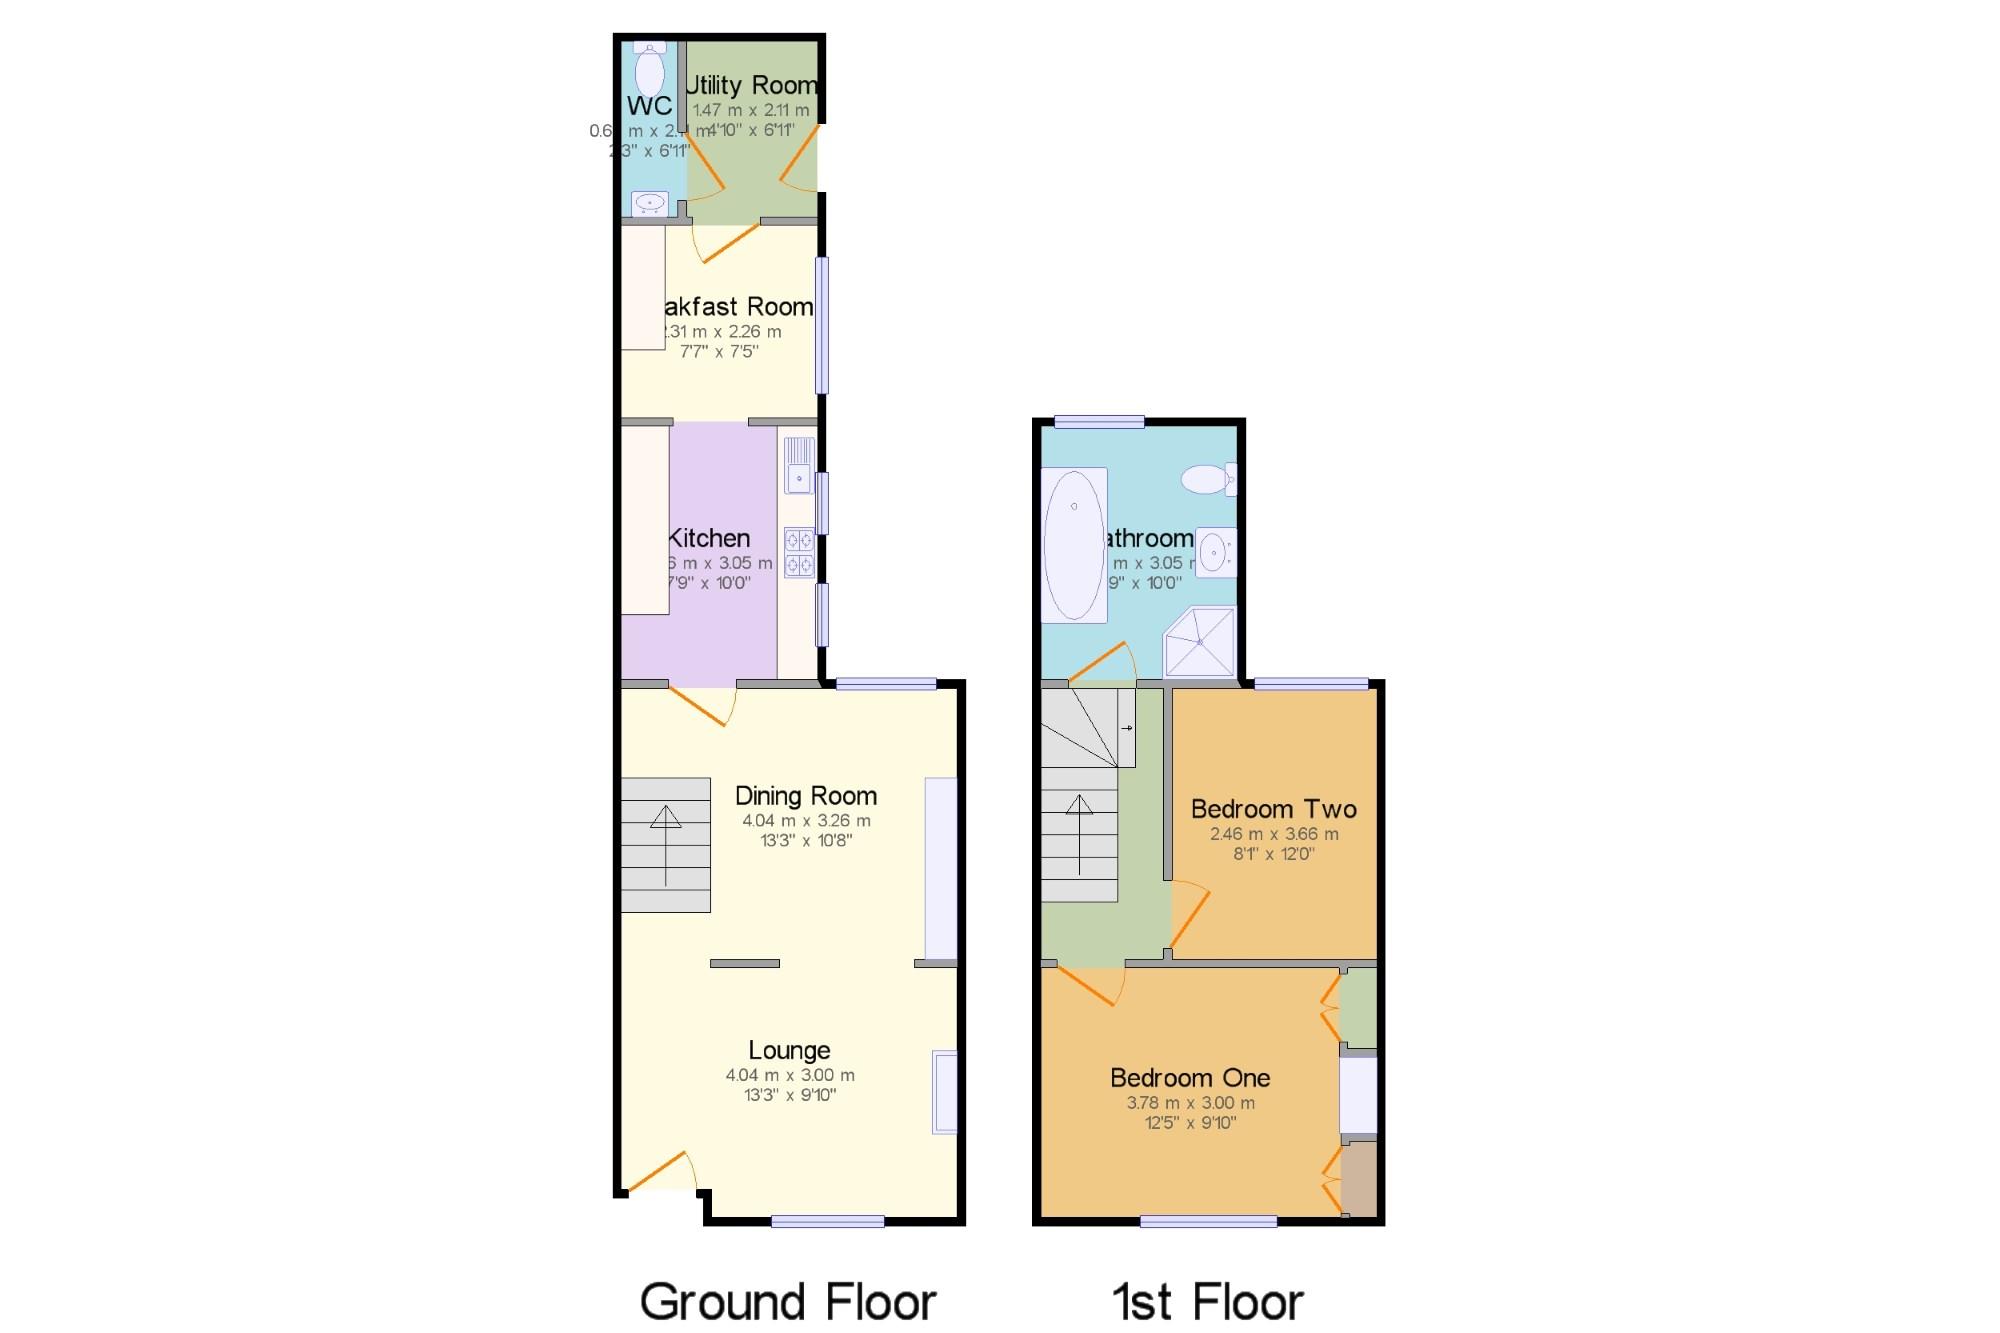 Kitchener street selby north yorkshire yo8 2 bedroom for 3 kitchener street leeds